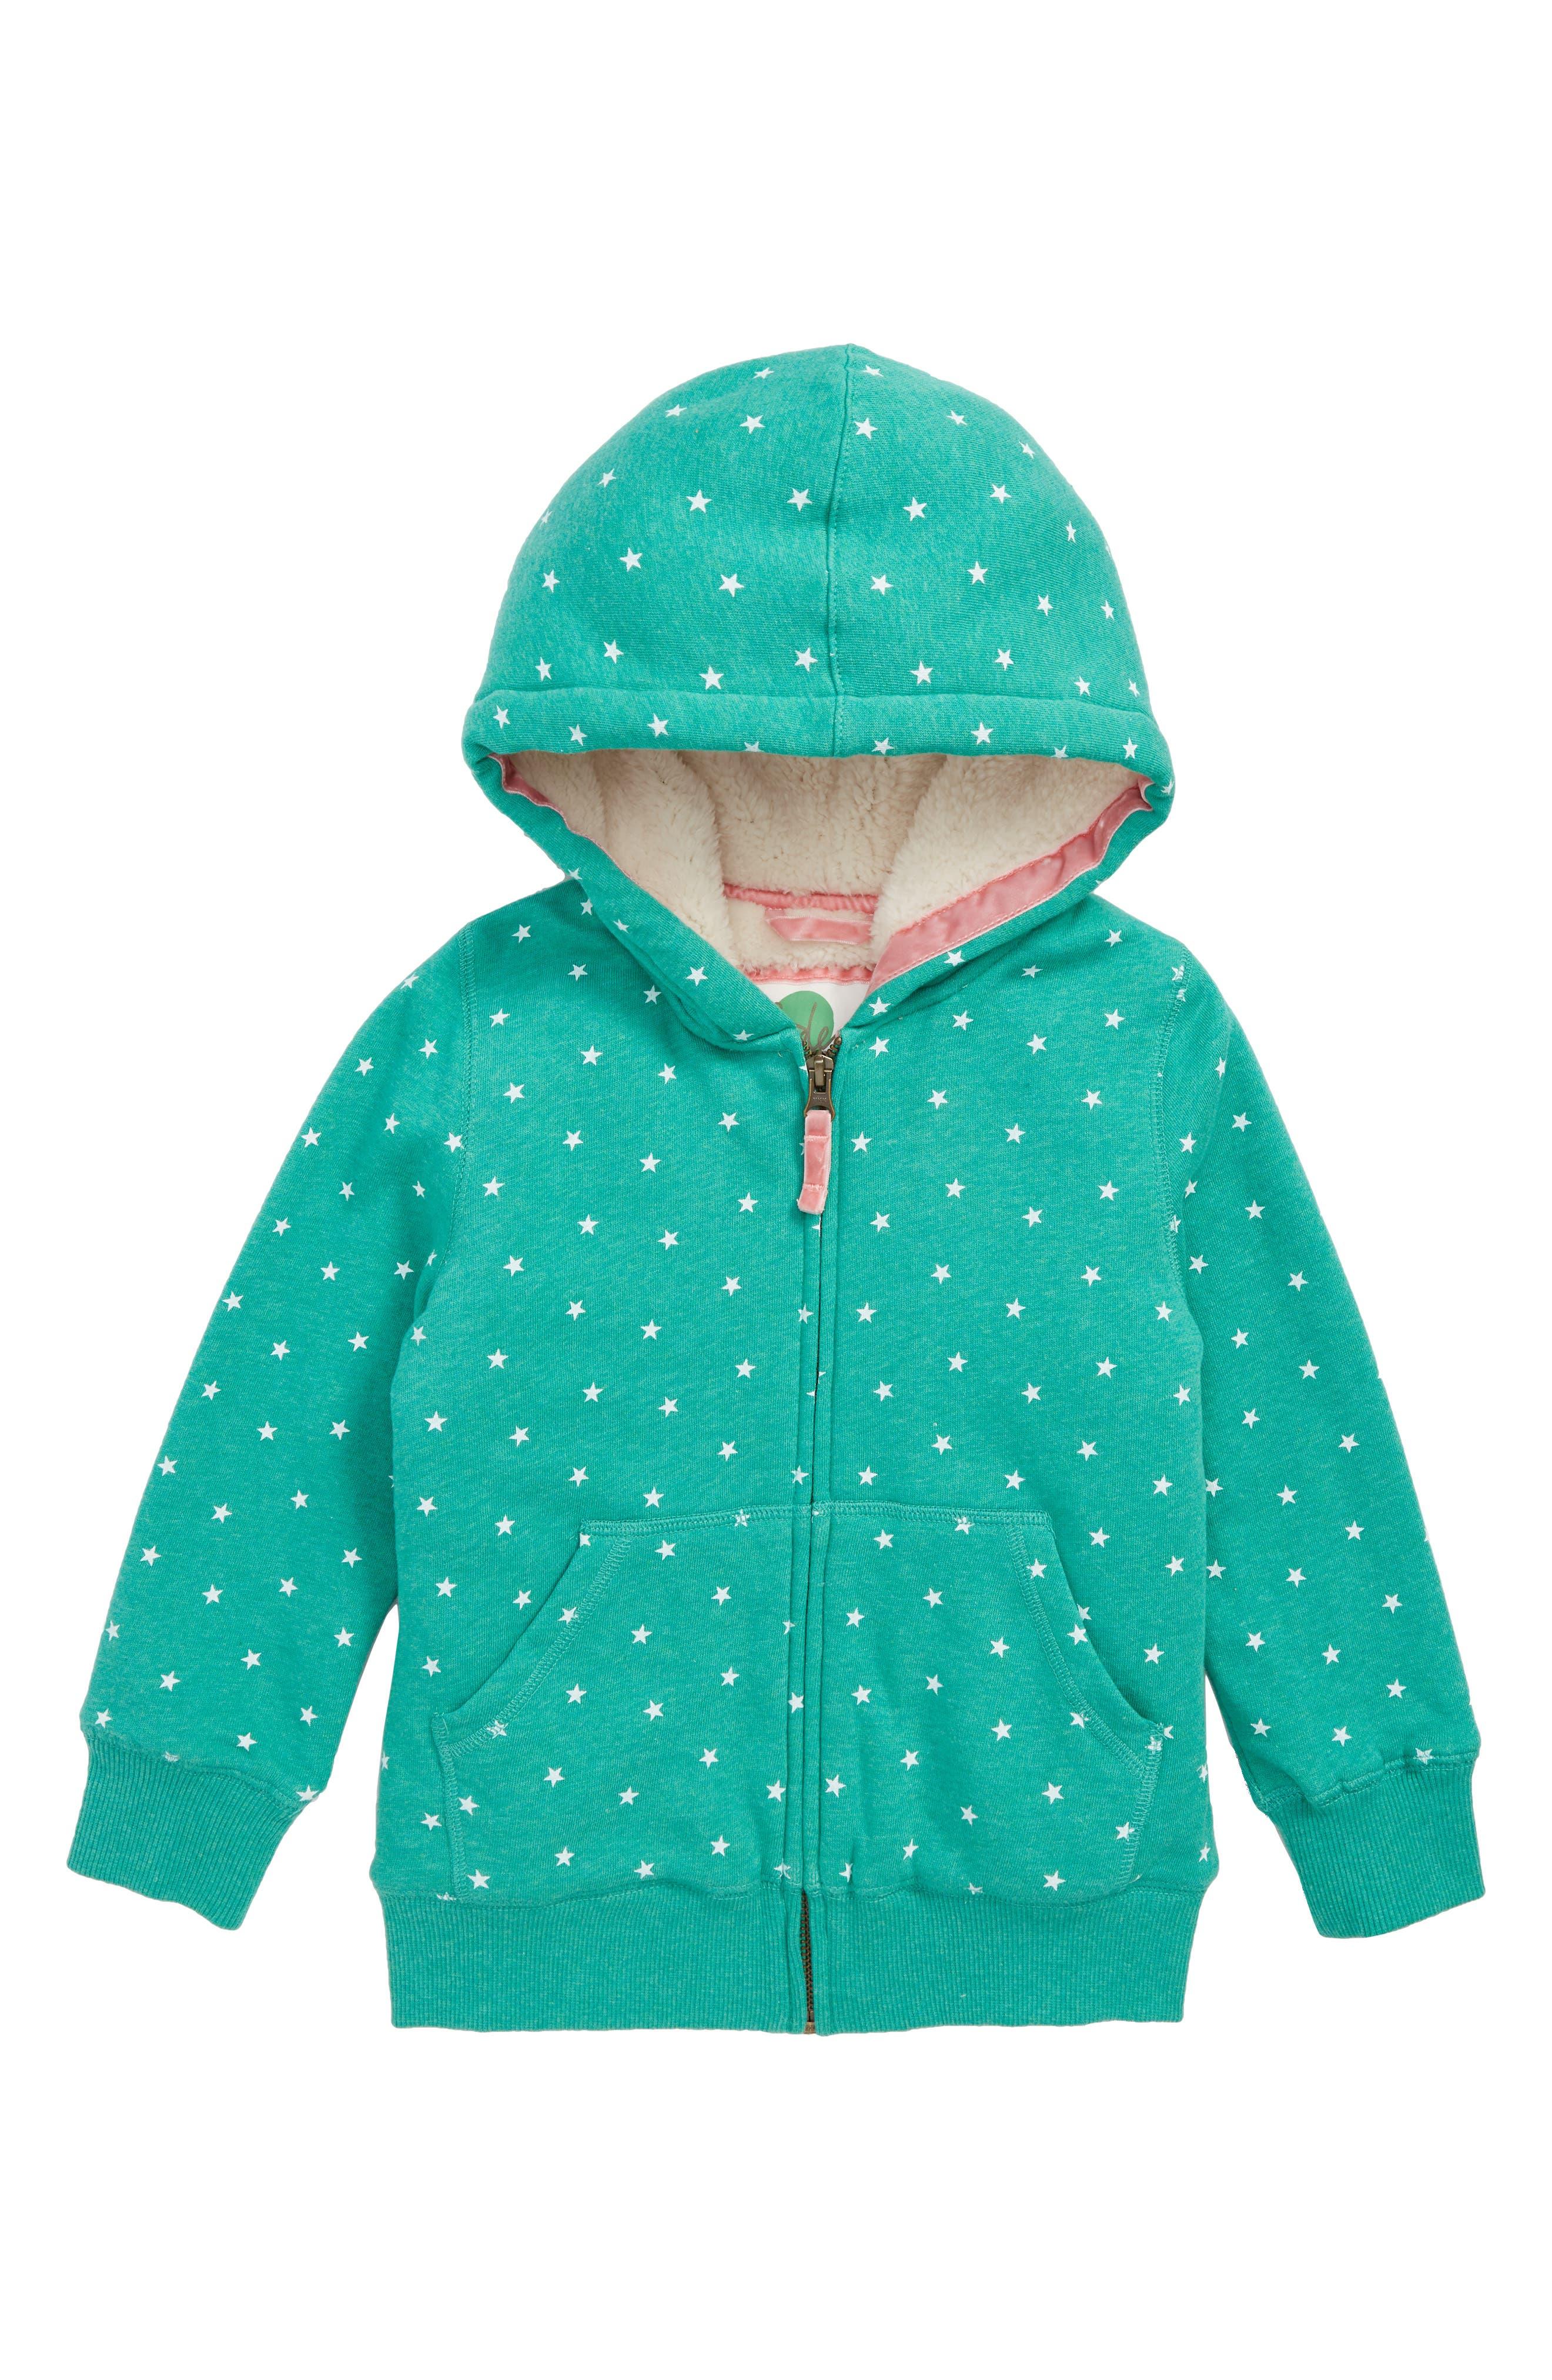 Fleece Lined Zip Hoodie,                         Main,                         color, JUNGLE GREEN MARLE/ ECRU STARS